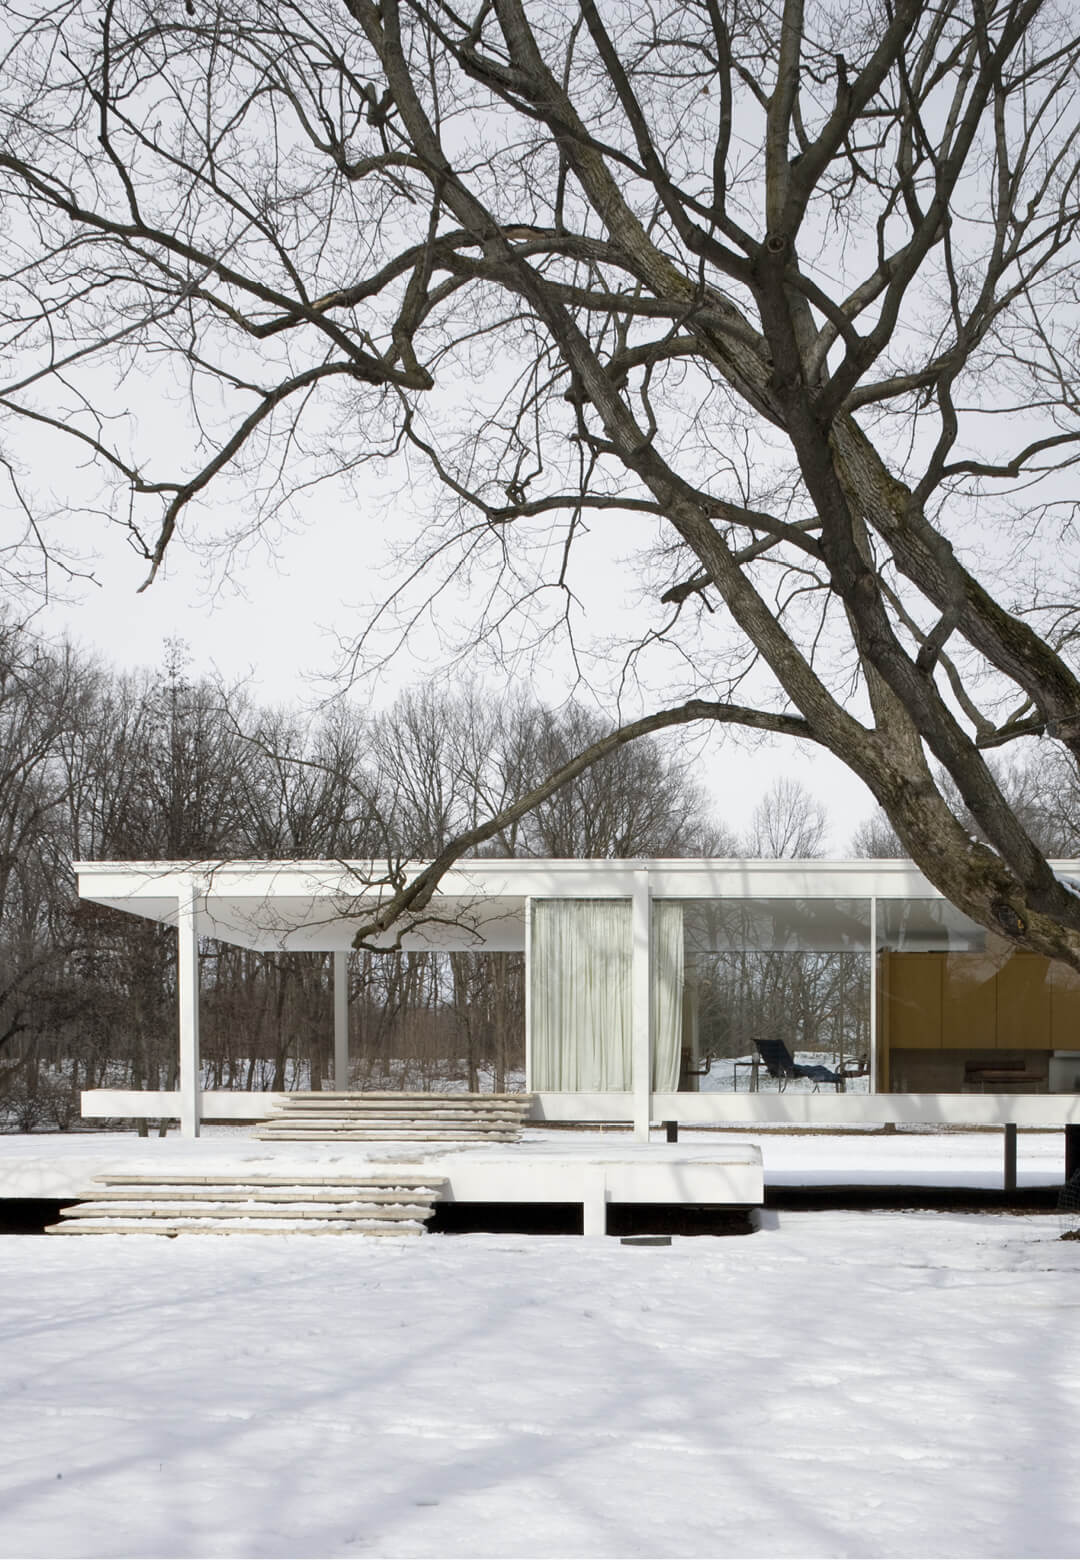 Ludwig Mies van der Rohe, Farnsworth House, Plano, Illinois, 1951| Ludwig Mies van der Rohe | STIRworld